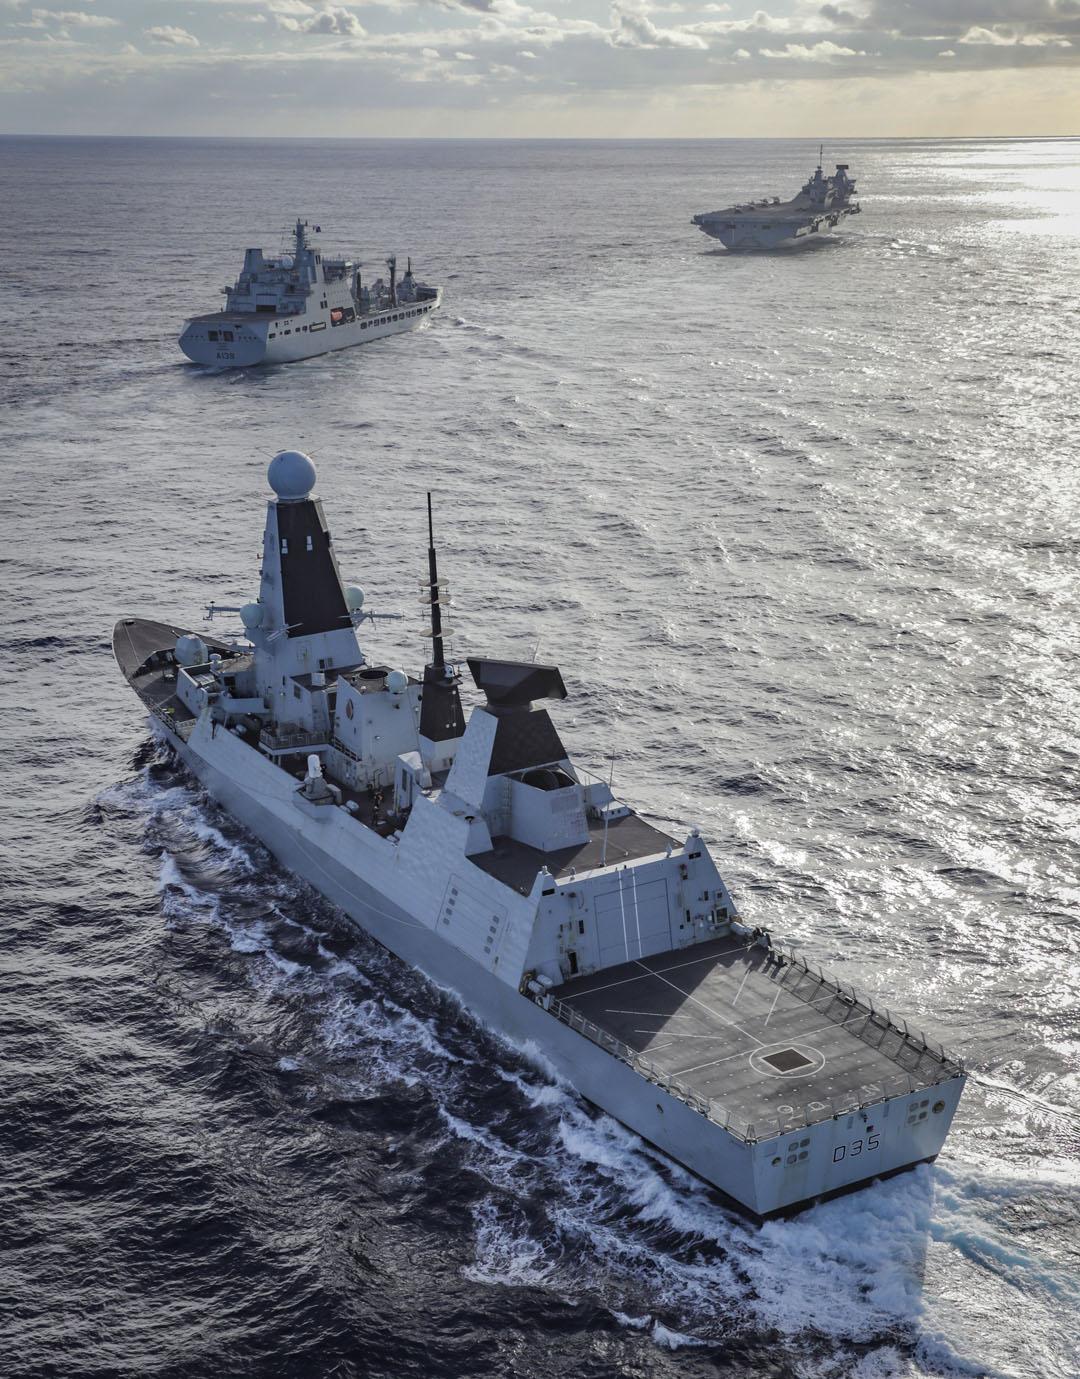 HMS Dragon, RFA Tideforce and HMS Queen Elizabeth sail together